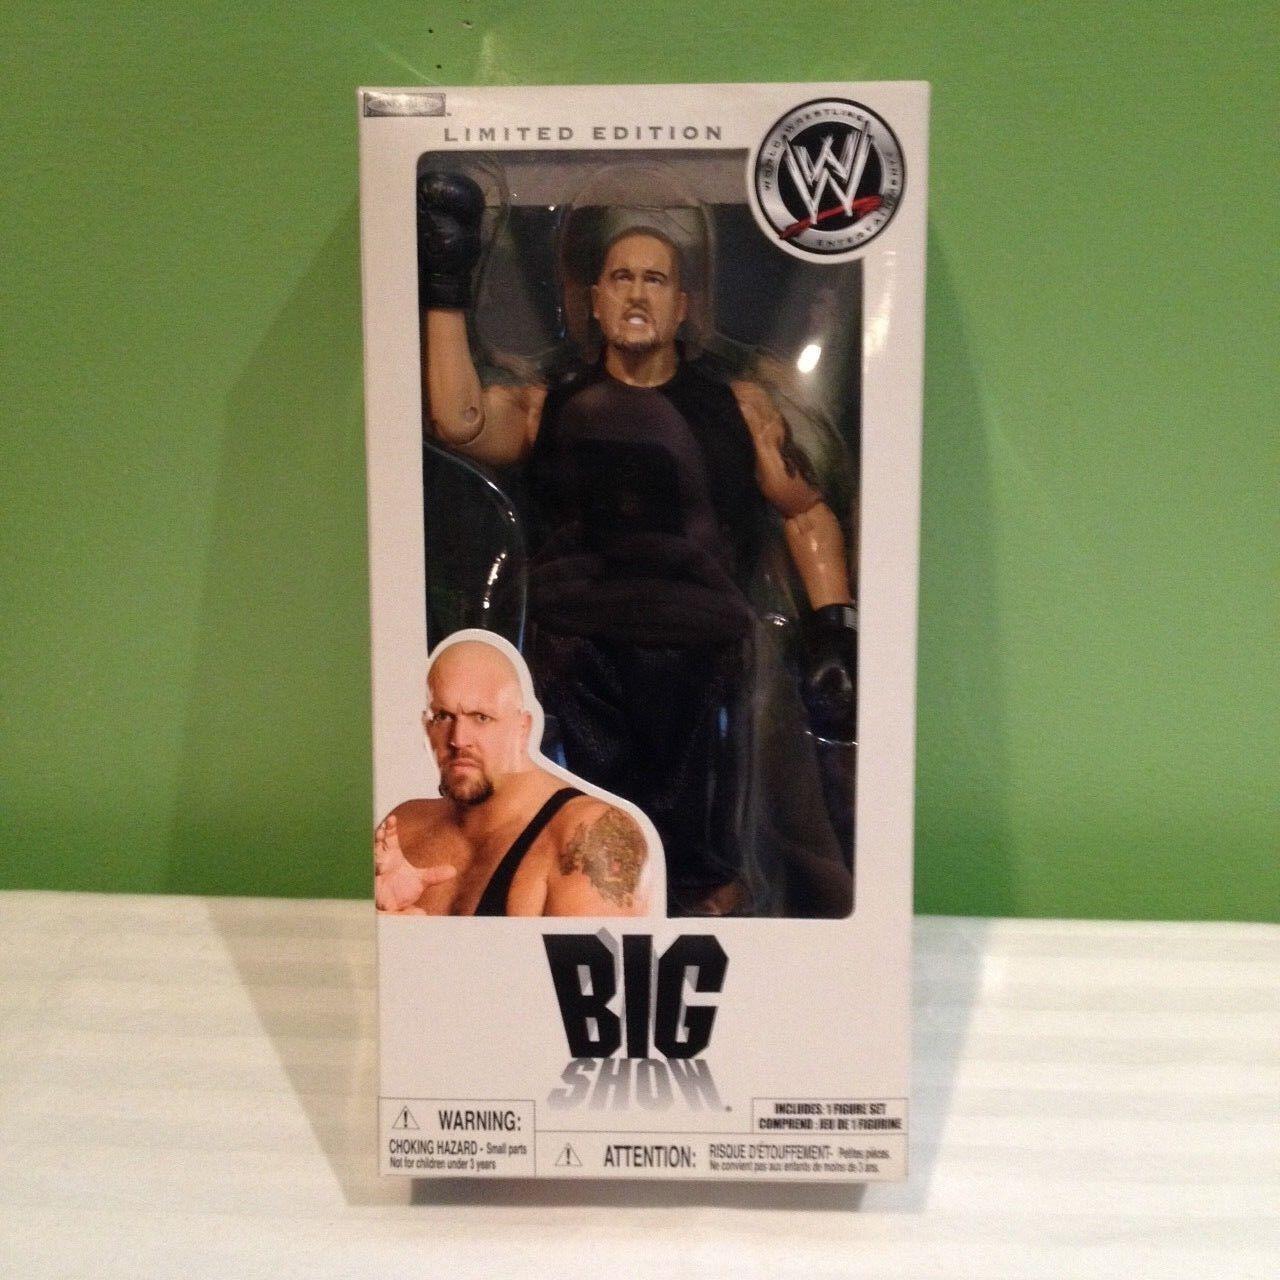 WWE WWF VERY RARE THE BIG SHOW LIMITED EDITION JAKKS WRESTLING FIGURE SHIPS FREE